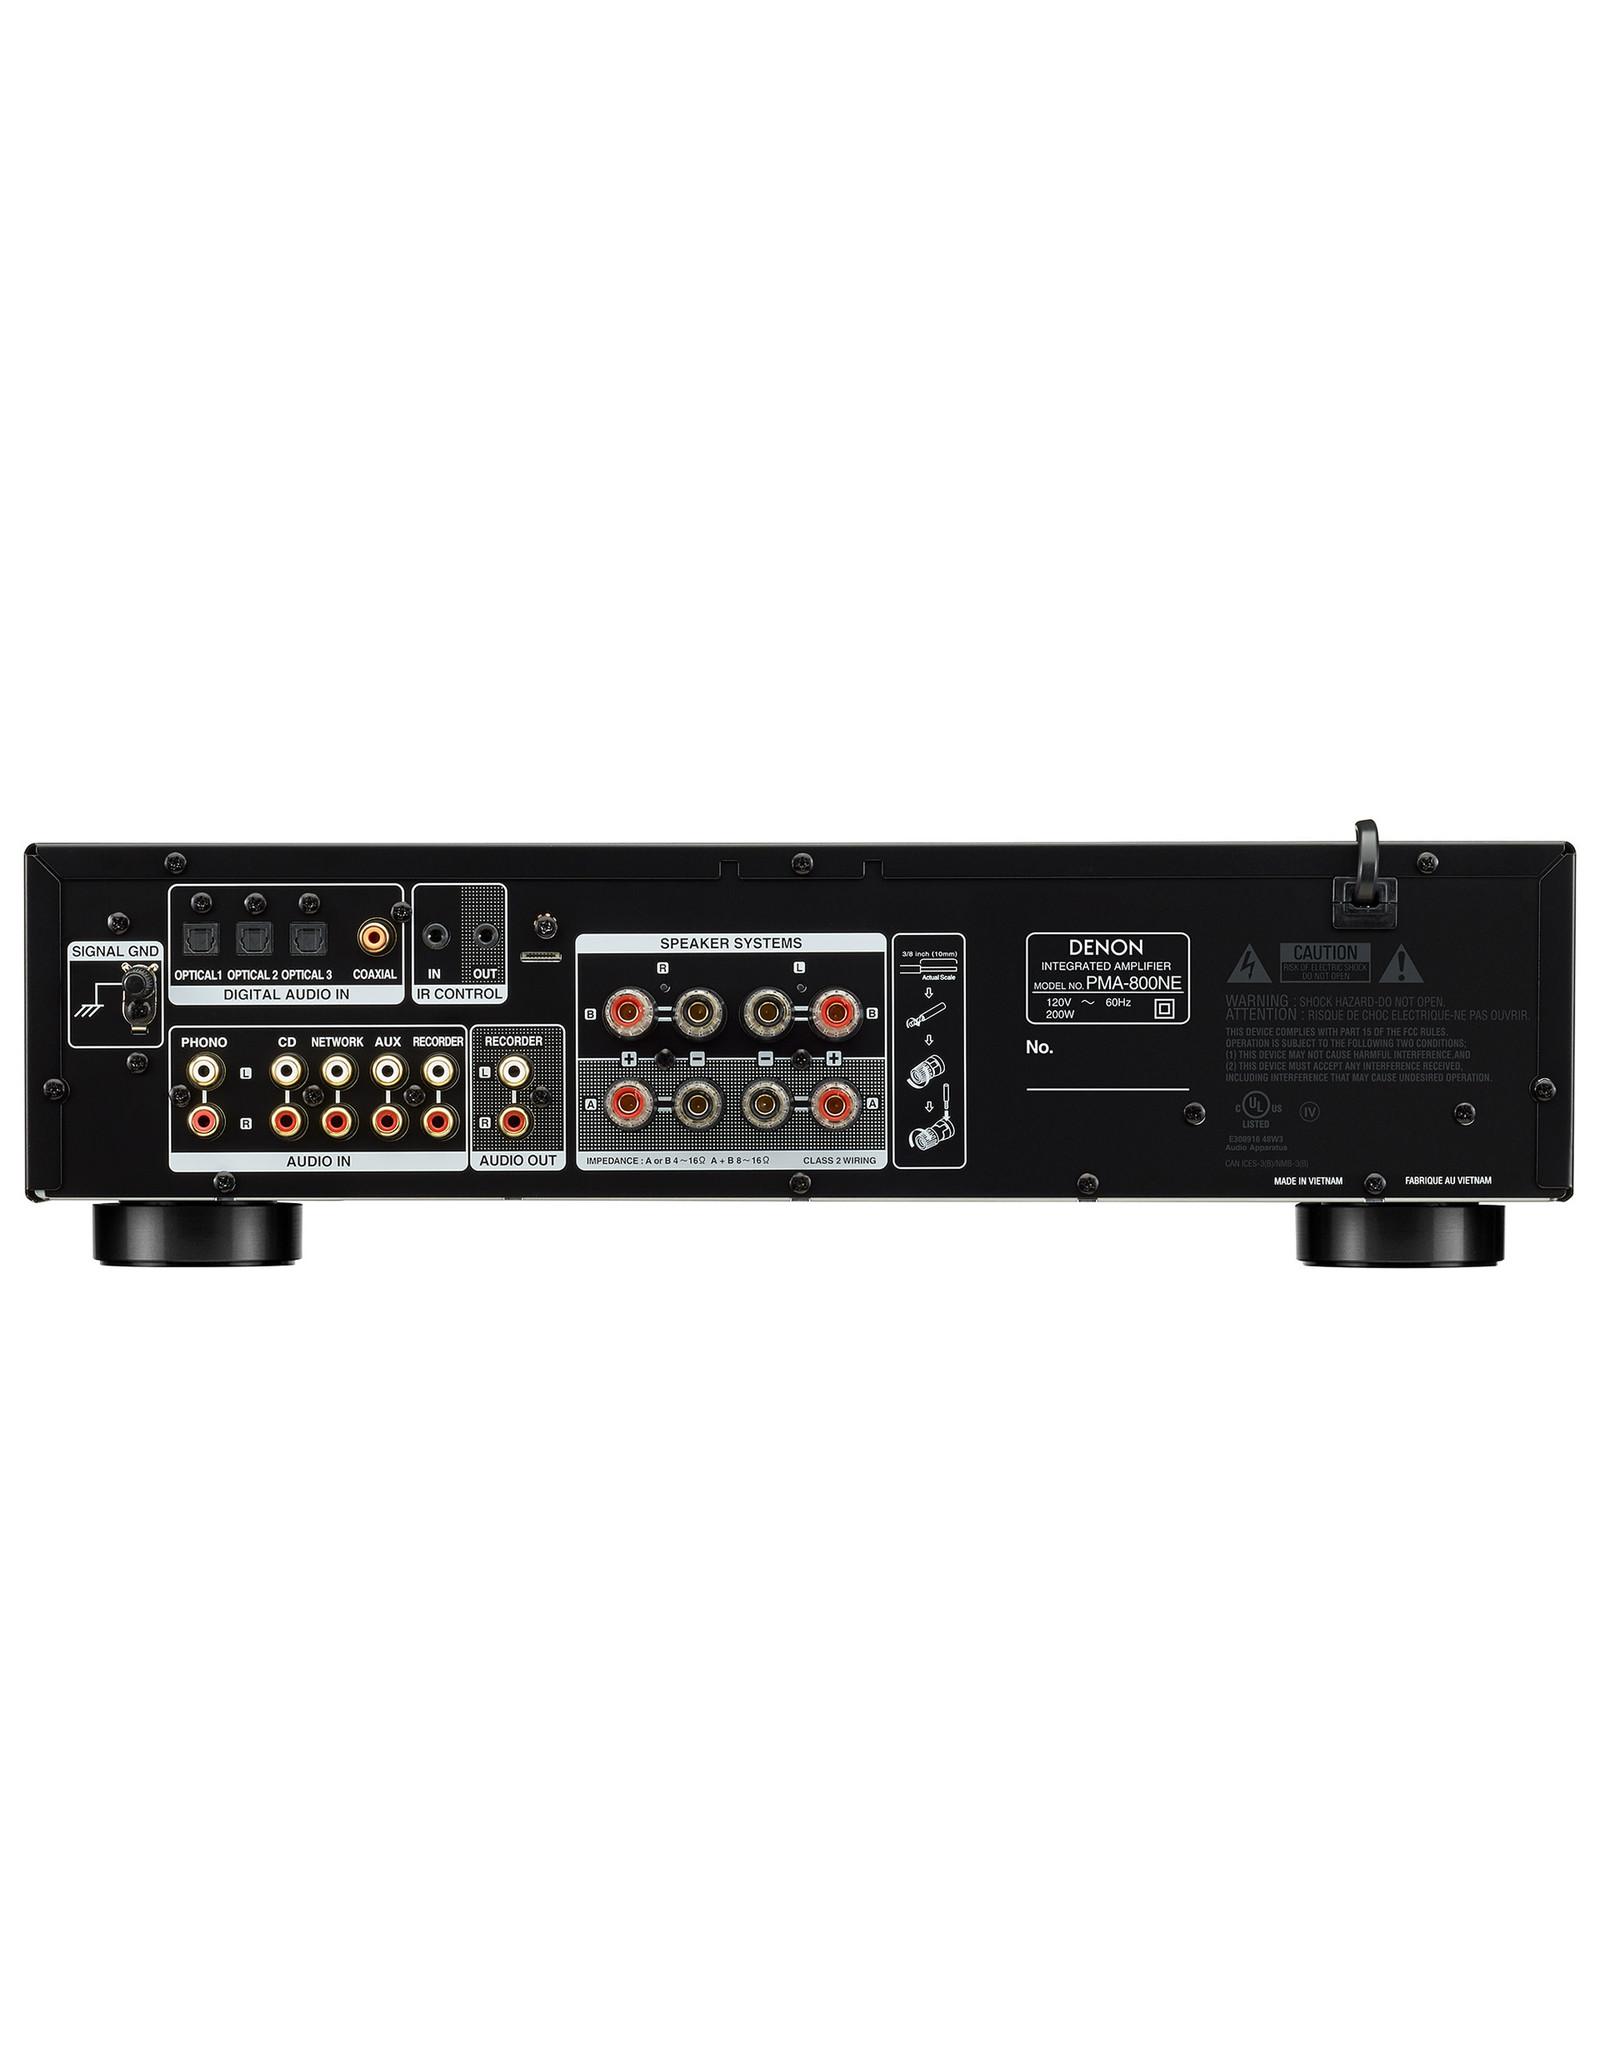 Denon Denon PMA-800NE Integrated Amp